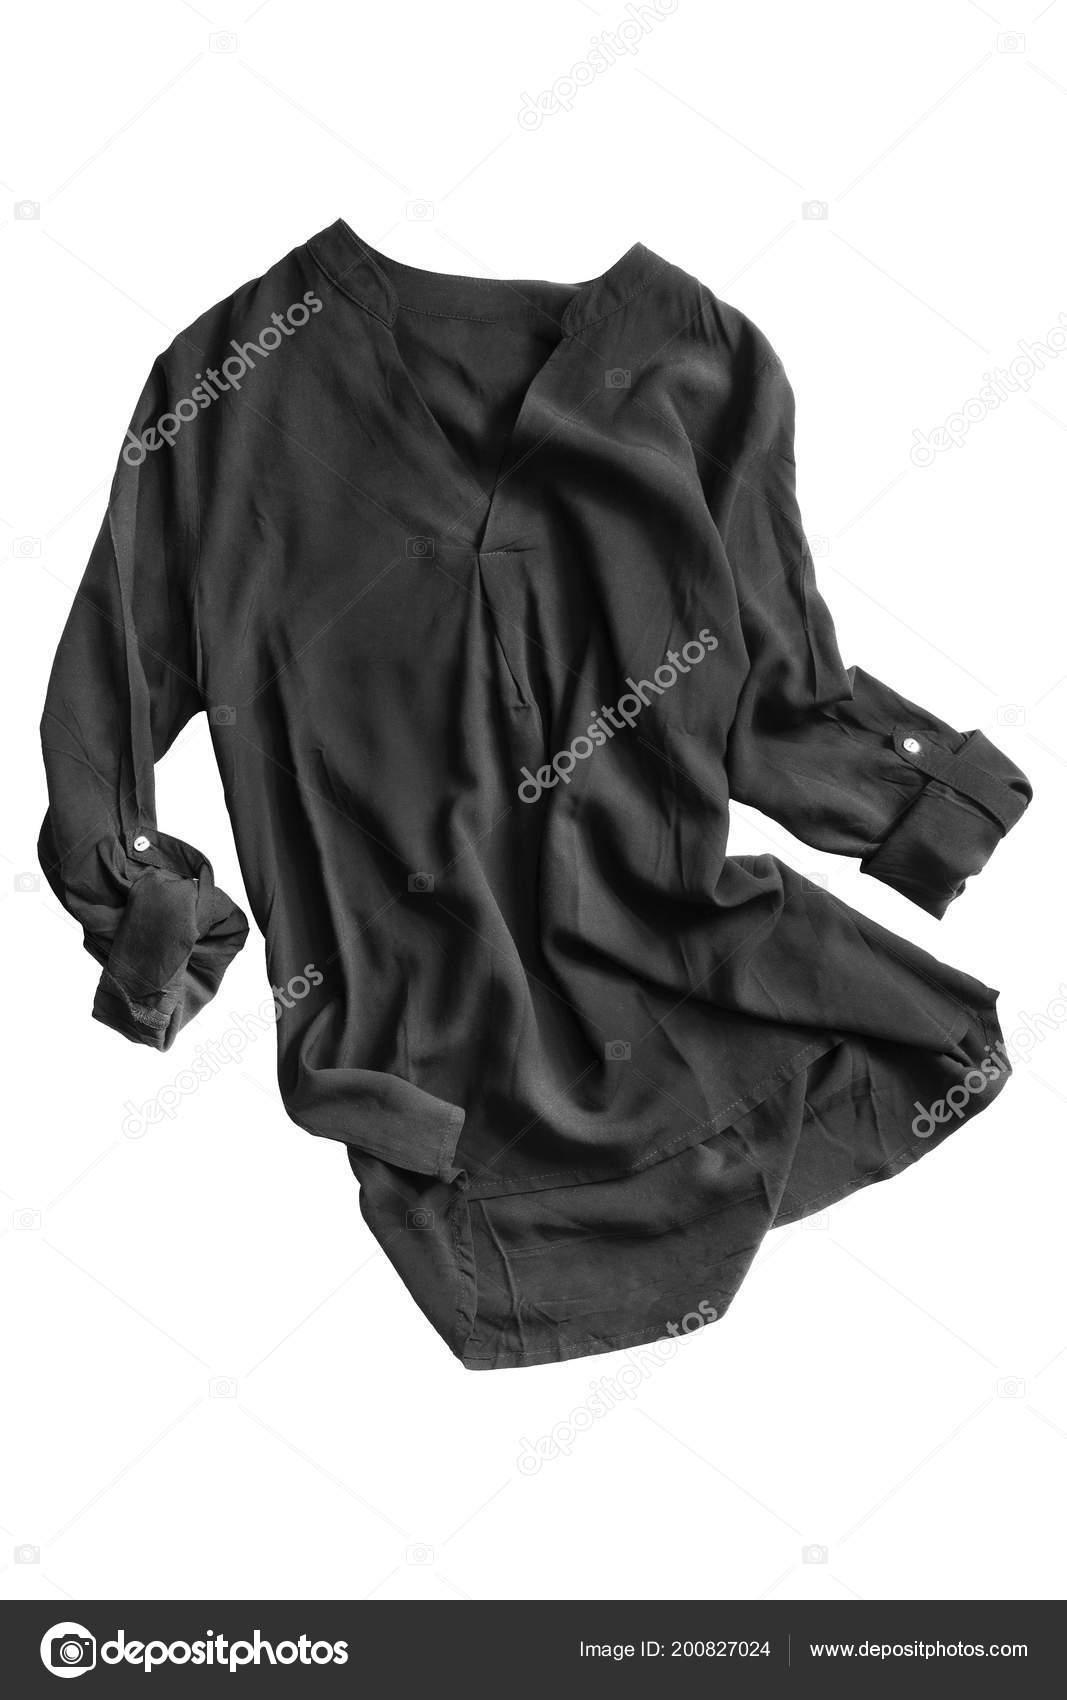 c0f4220ade Blusa de seda negro arrugado manga enrollada sobre fondo blanco– Imagen de  Archivo